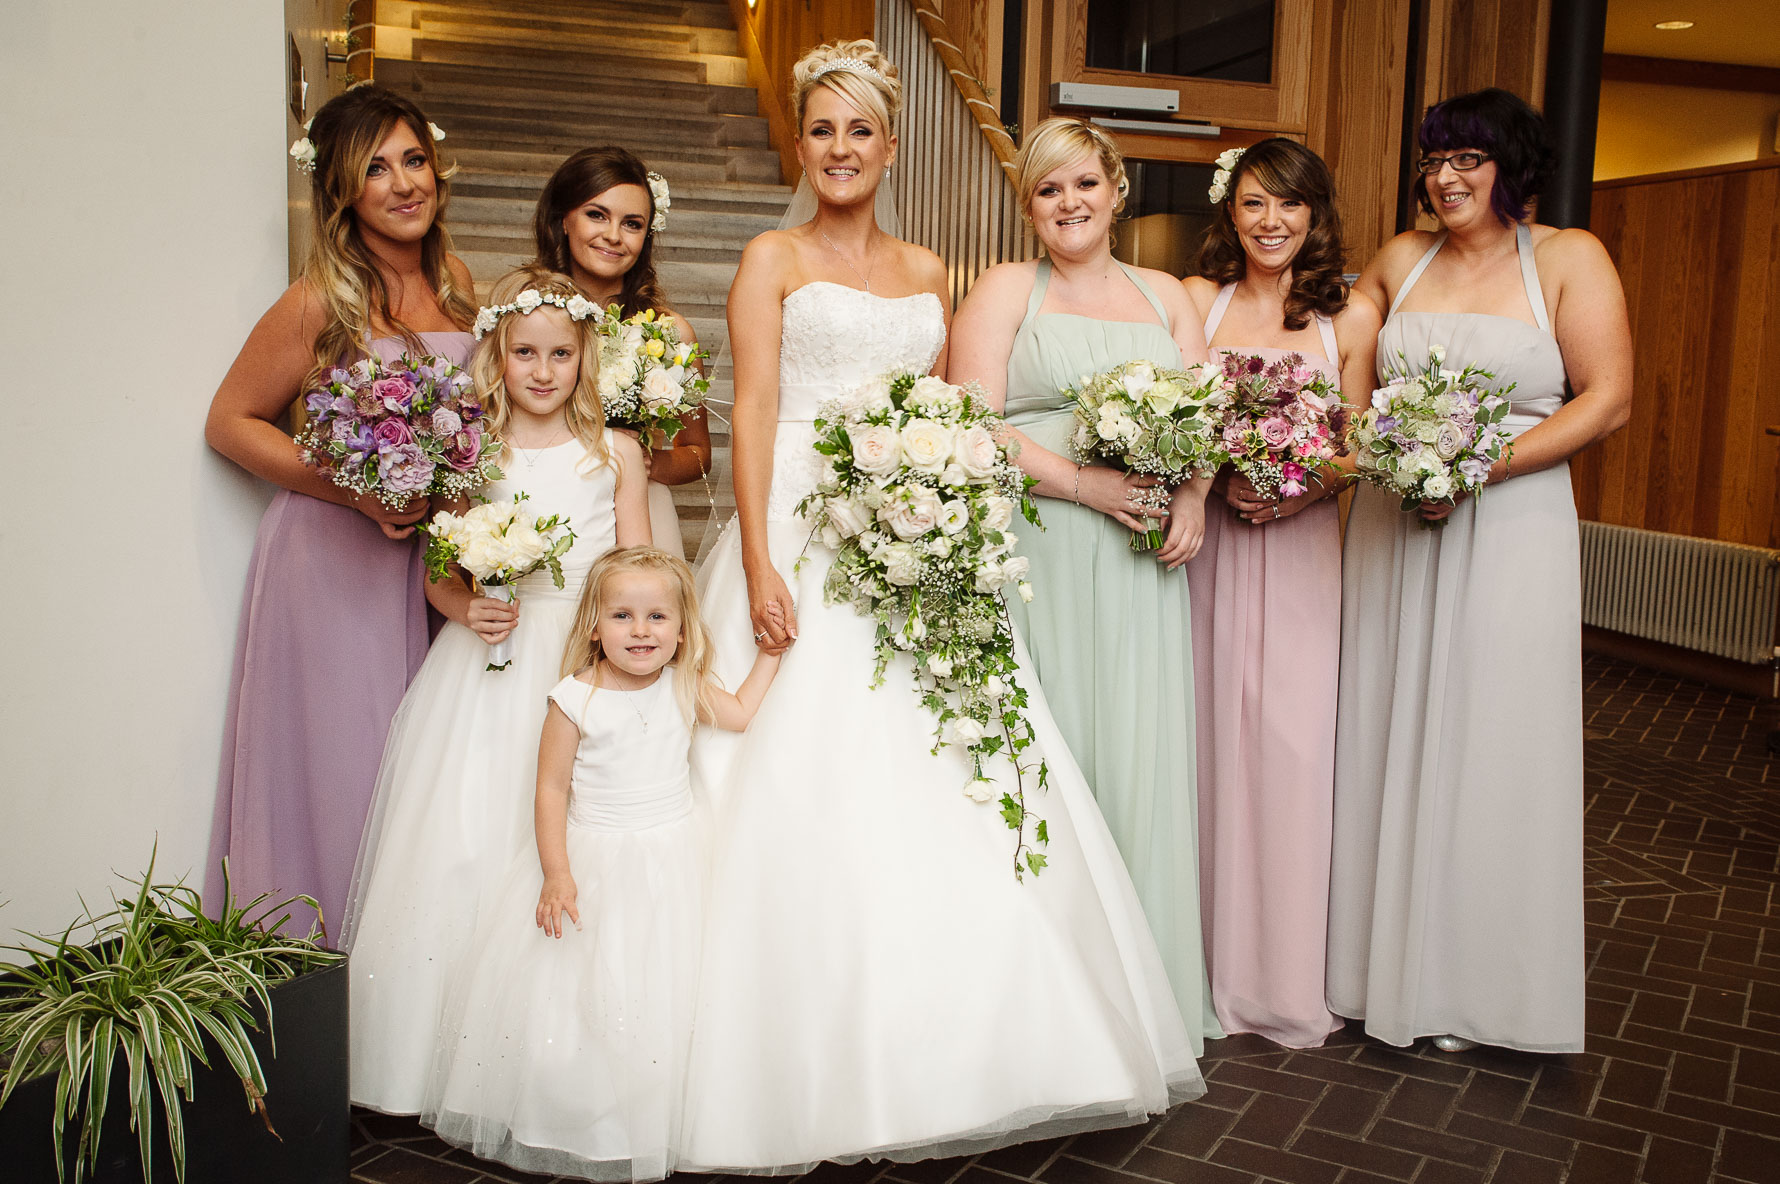 Canterbury Cathedral Lodge Wedding58-20141004 0926